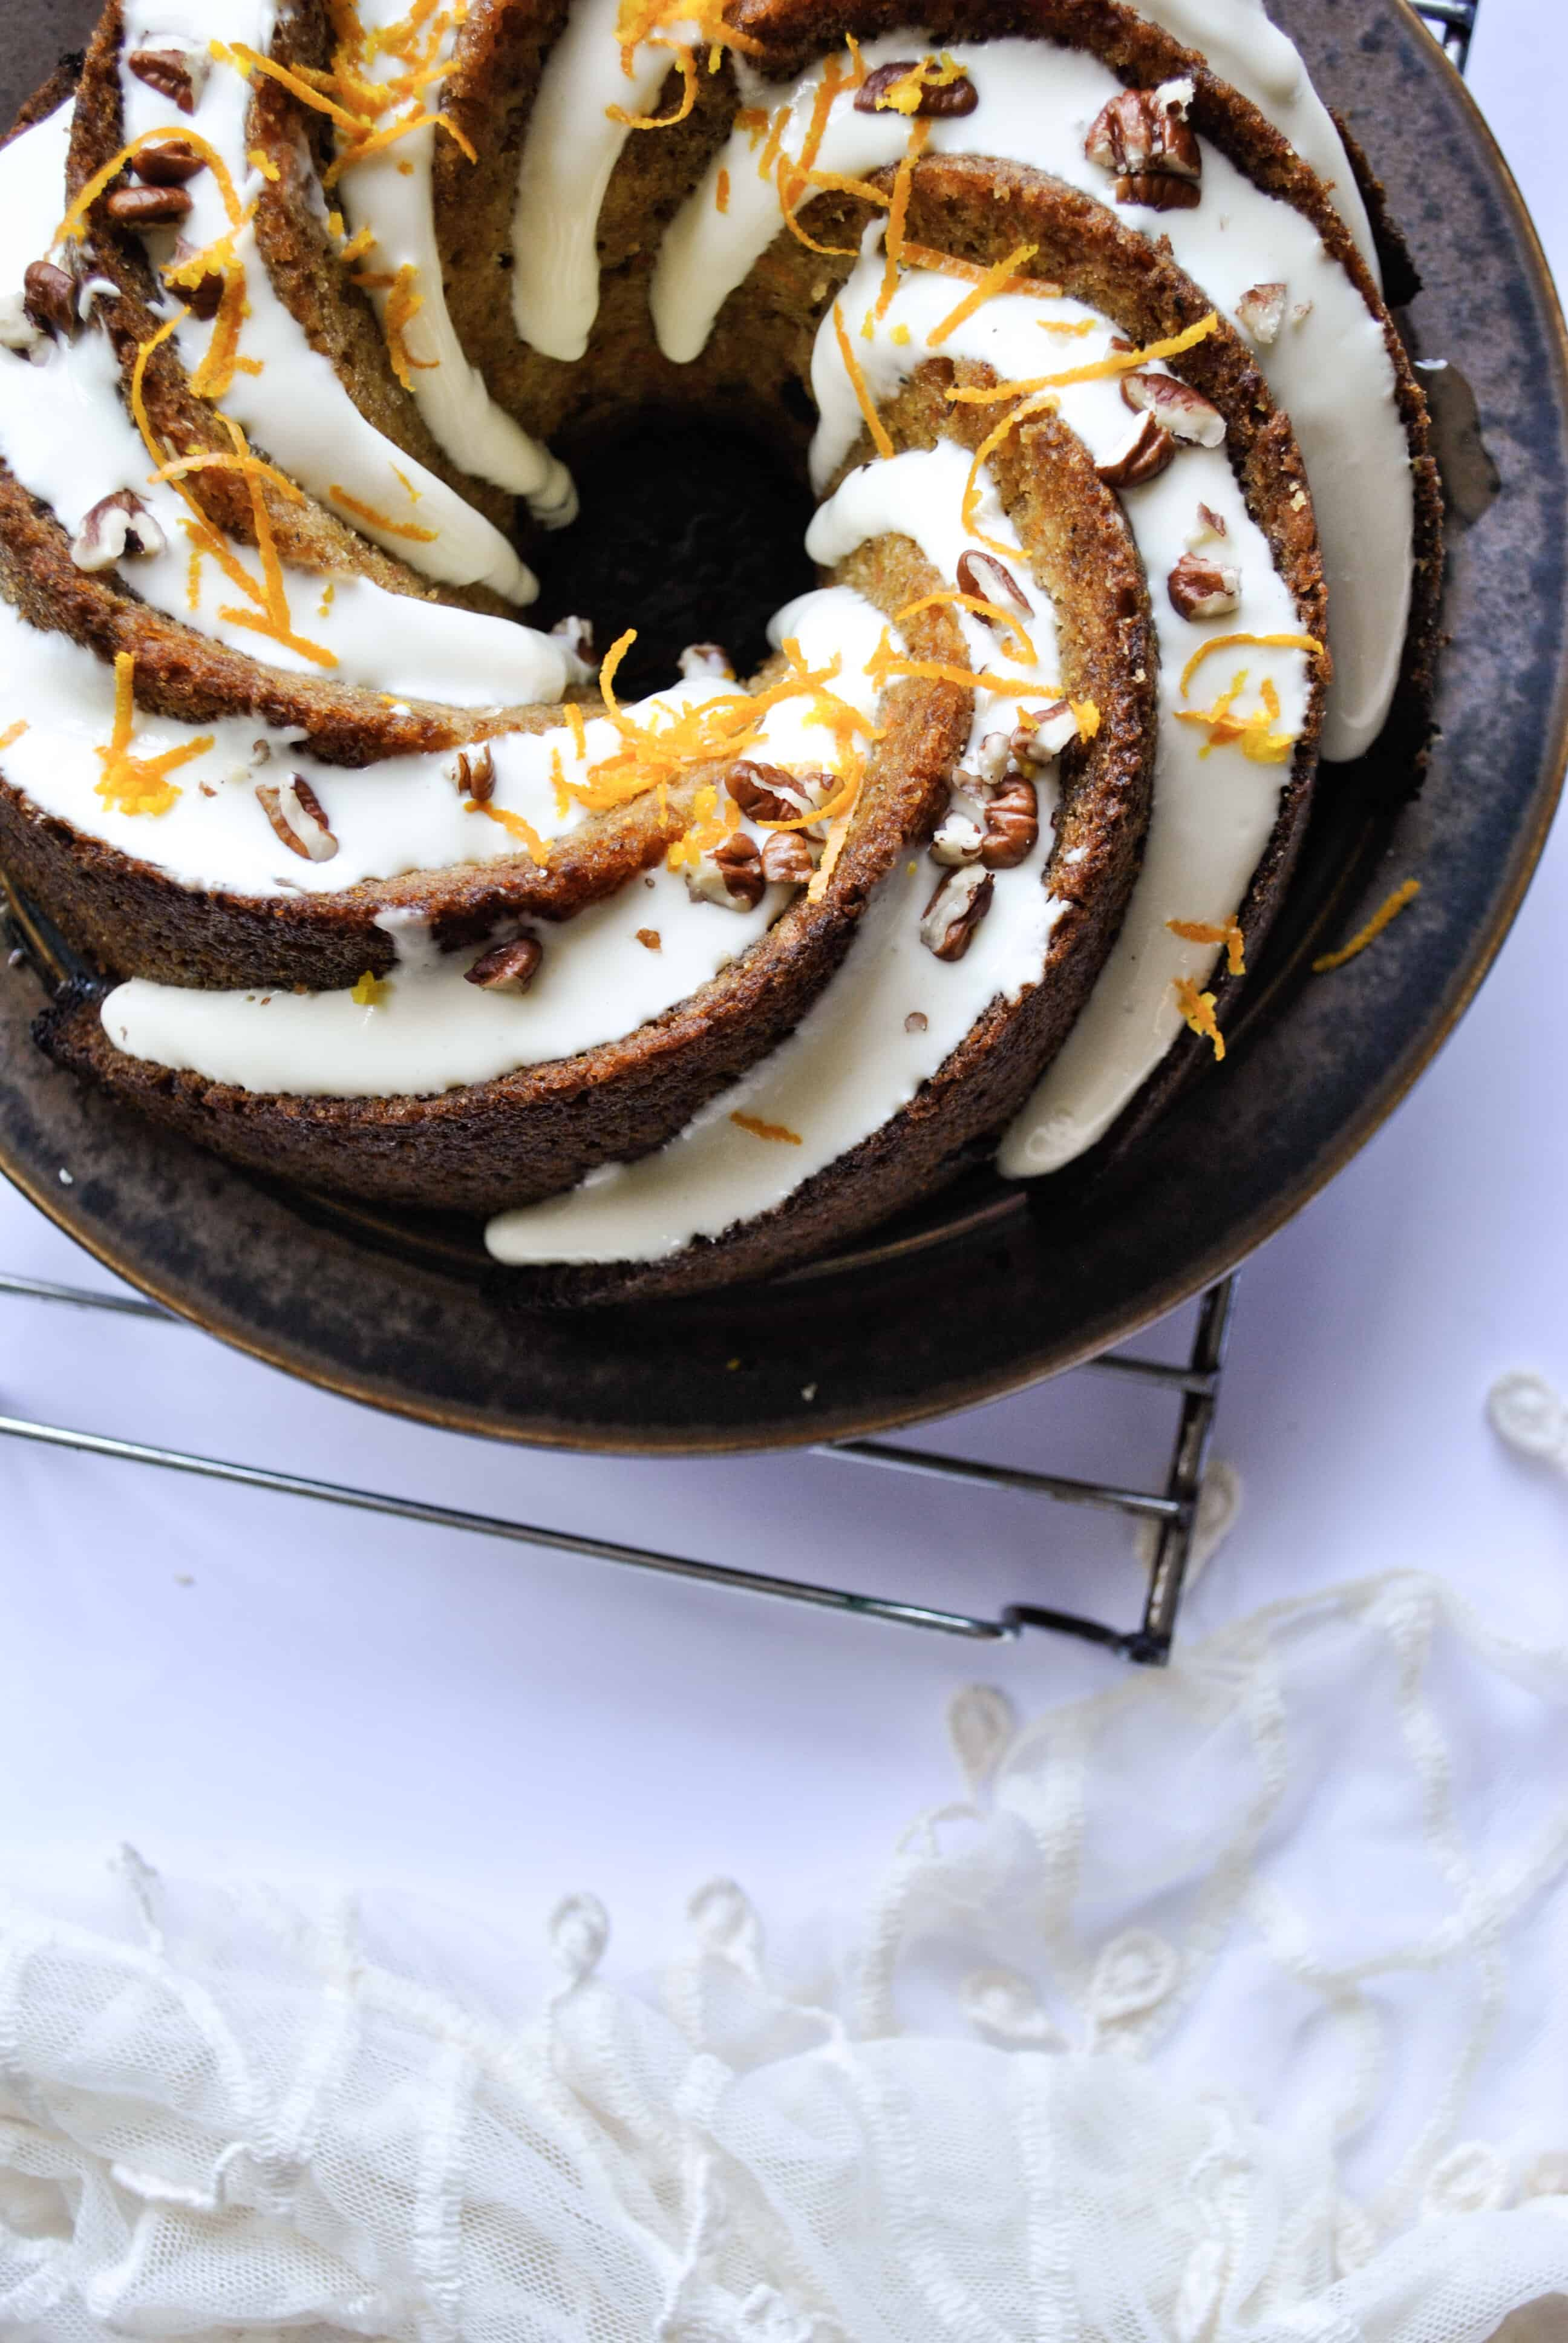 Cassava Flour Carrot Cake | pranathrive.com #glutenfree #grainfree #refinedsugarfree #dairyfree